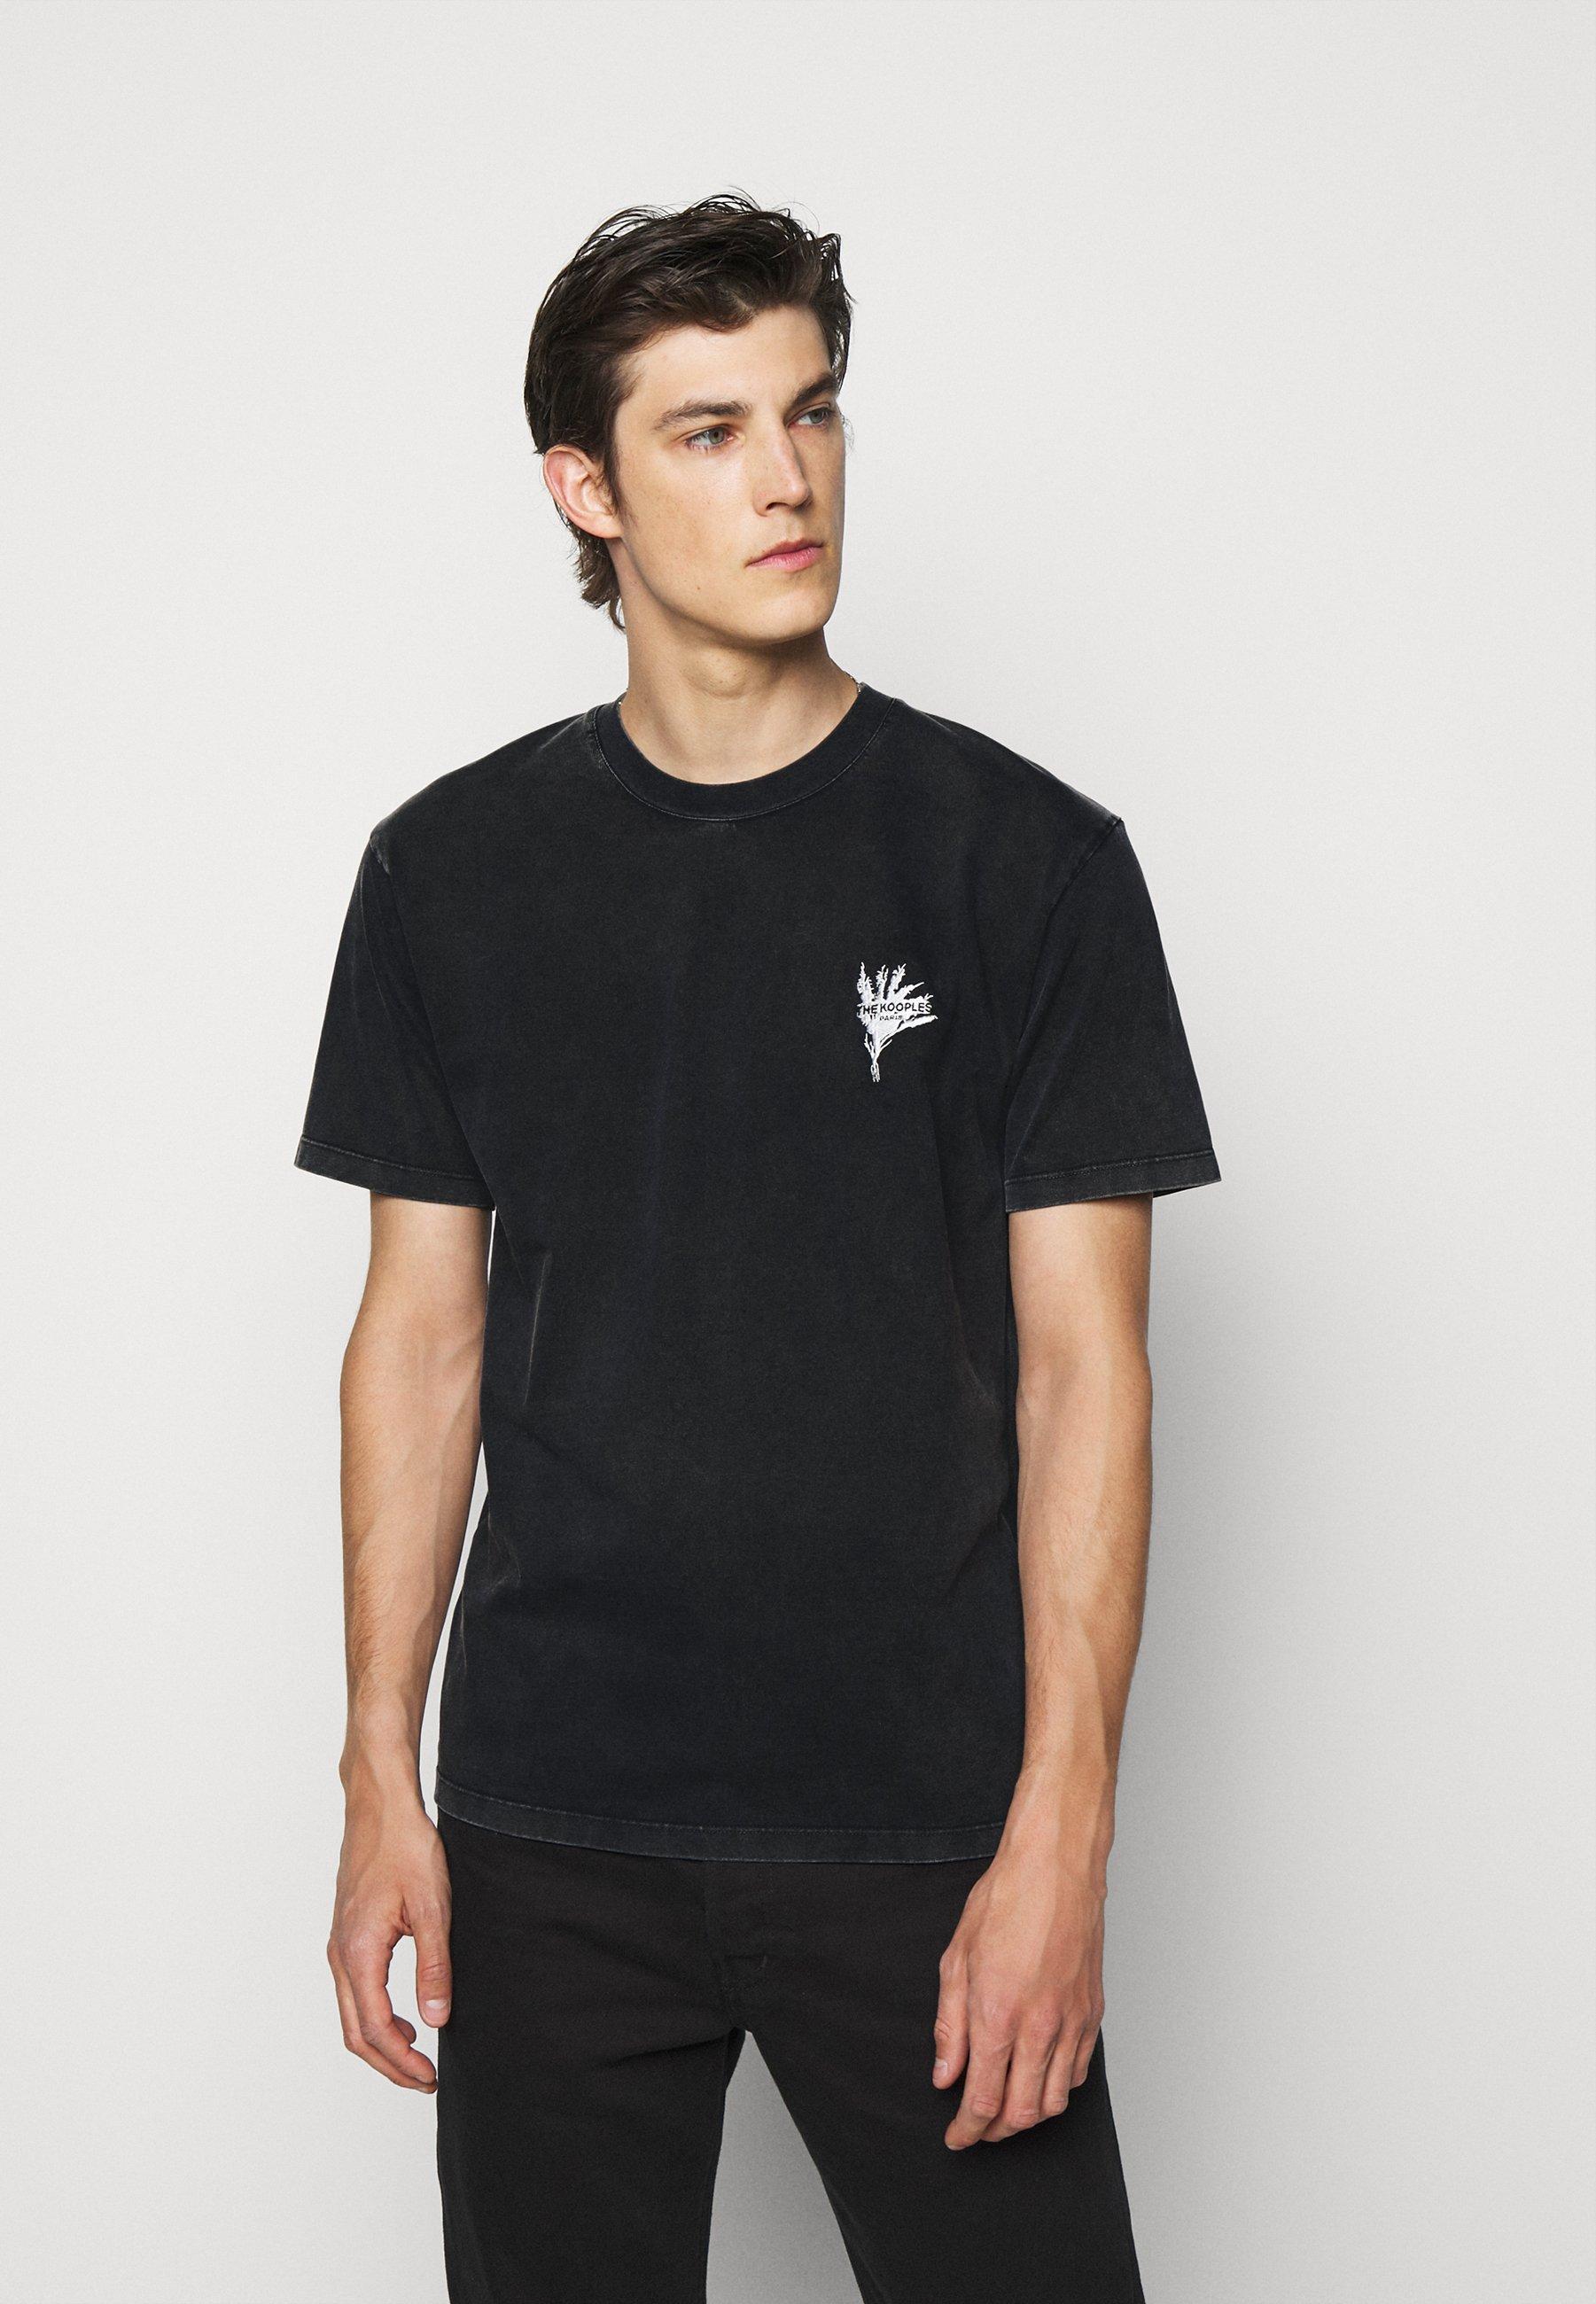 Homme WALK ON THE WILD SIDE - T-shirt imprimé